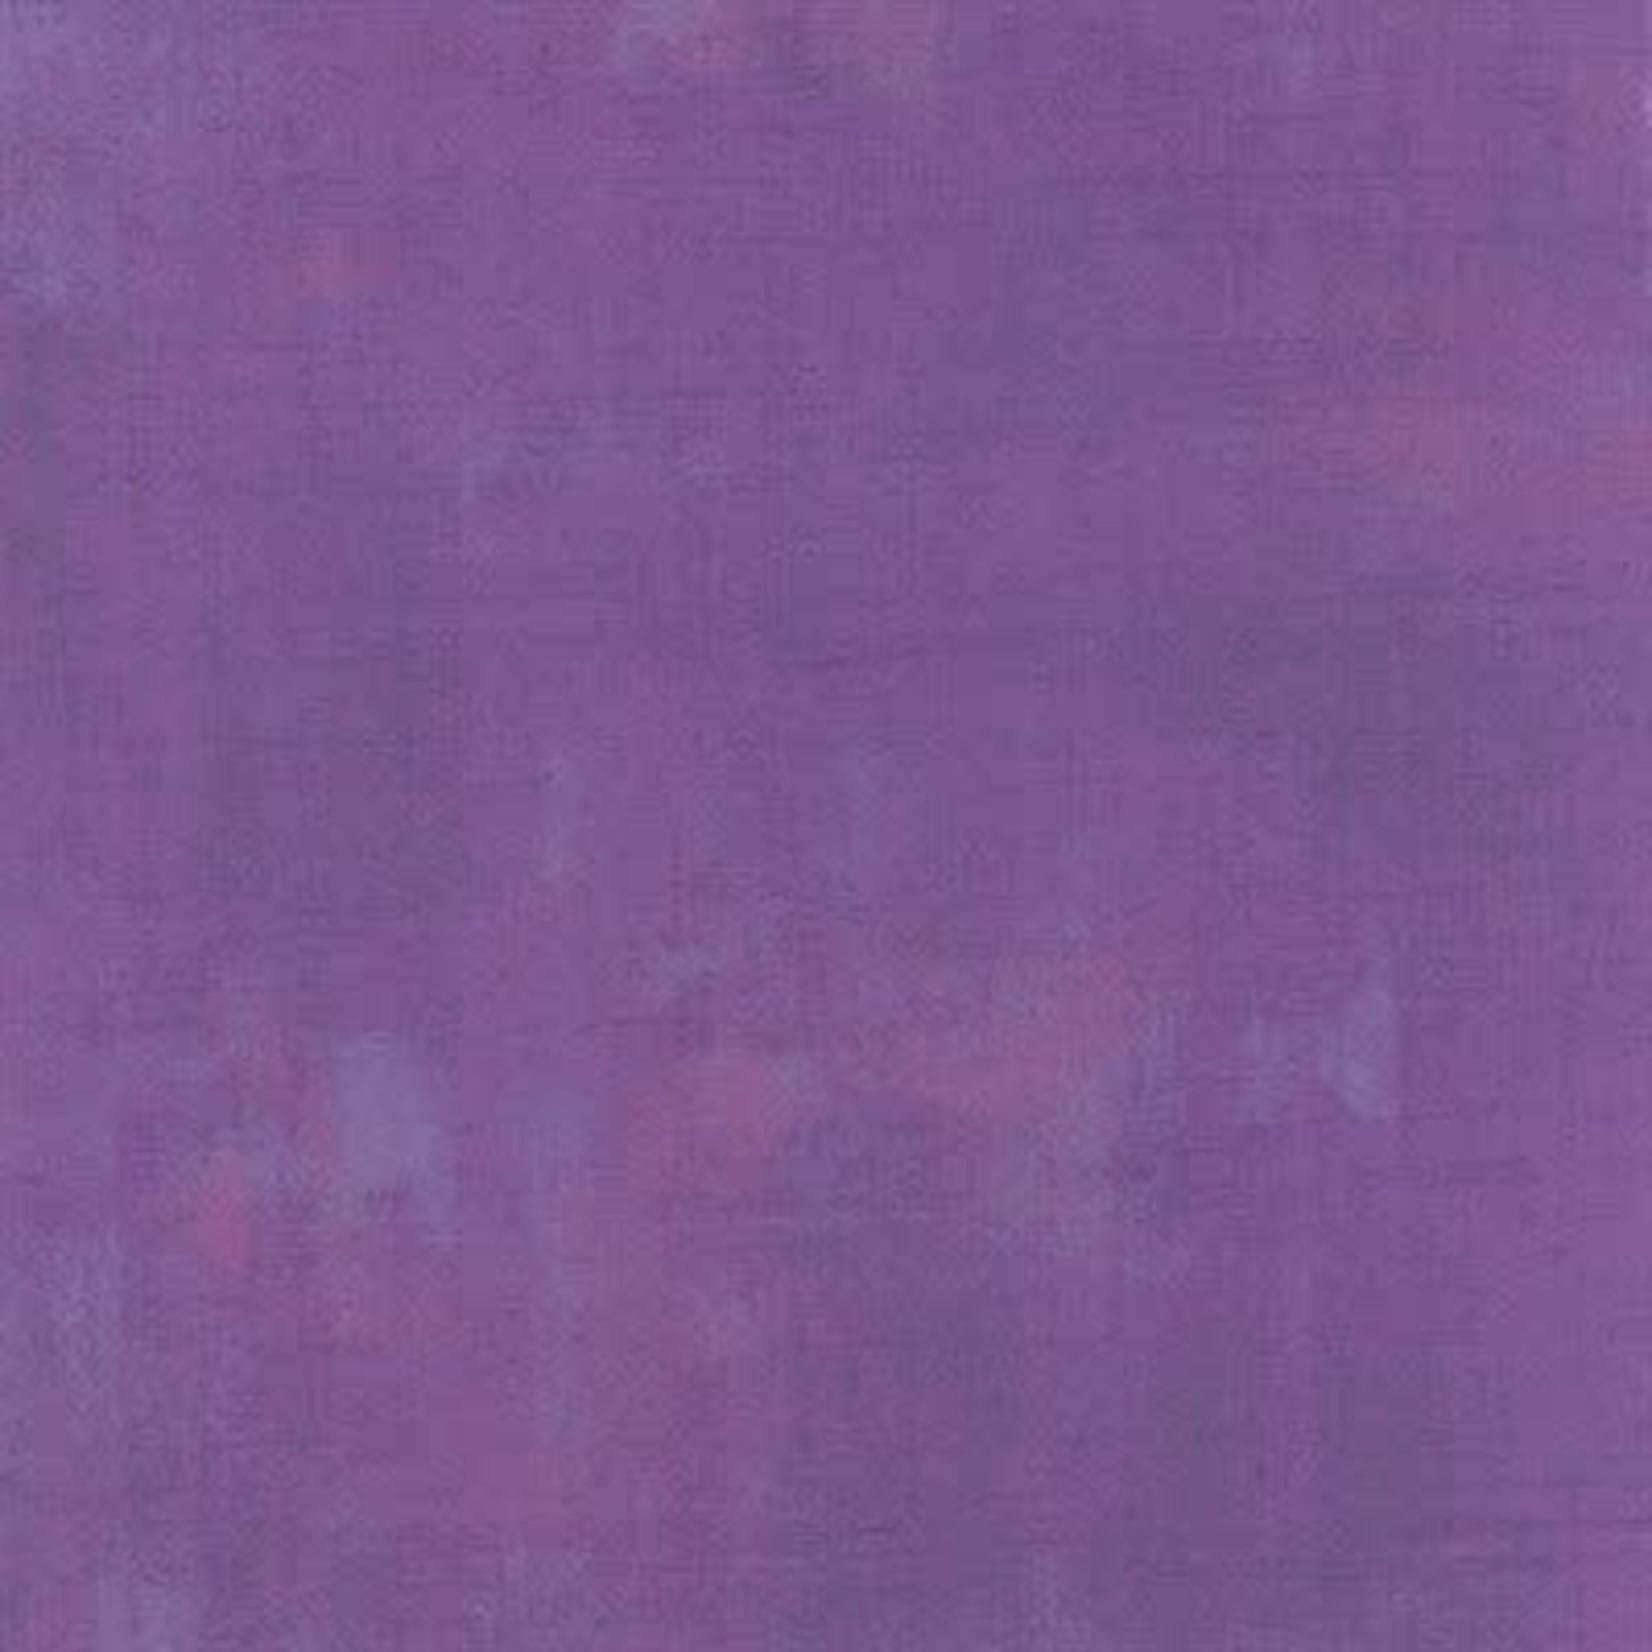 Moda GRUNGE BASICS Grunge - Grape per cm or $20/m